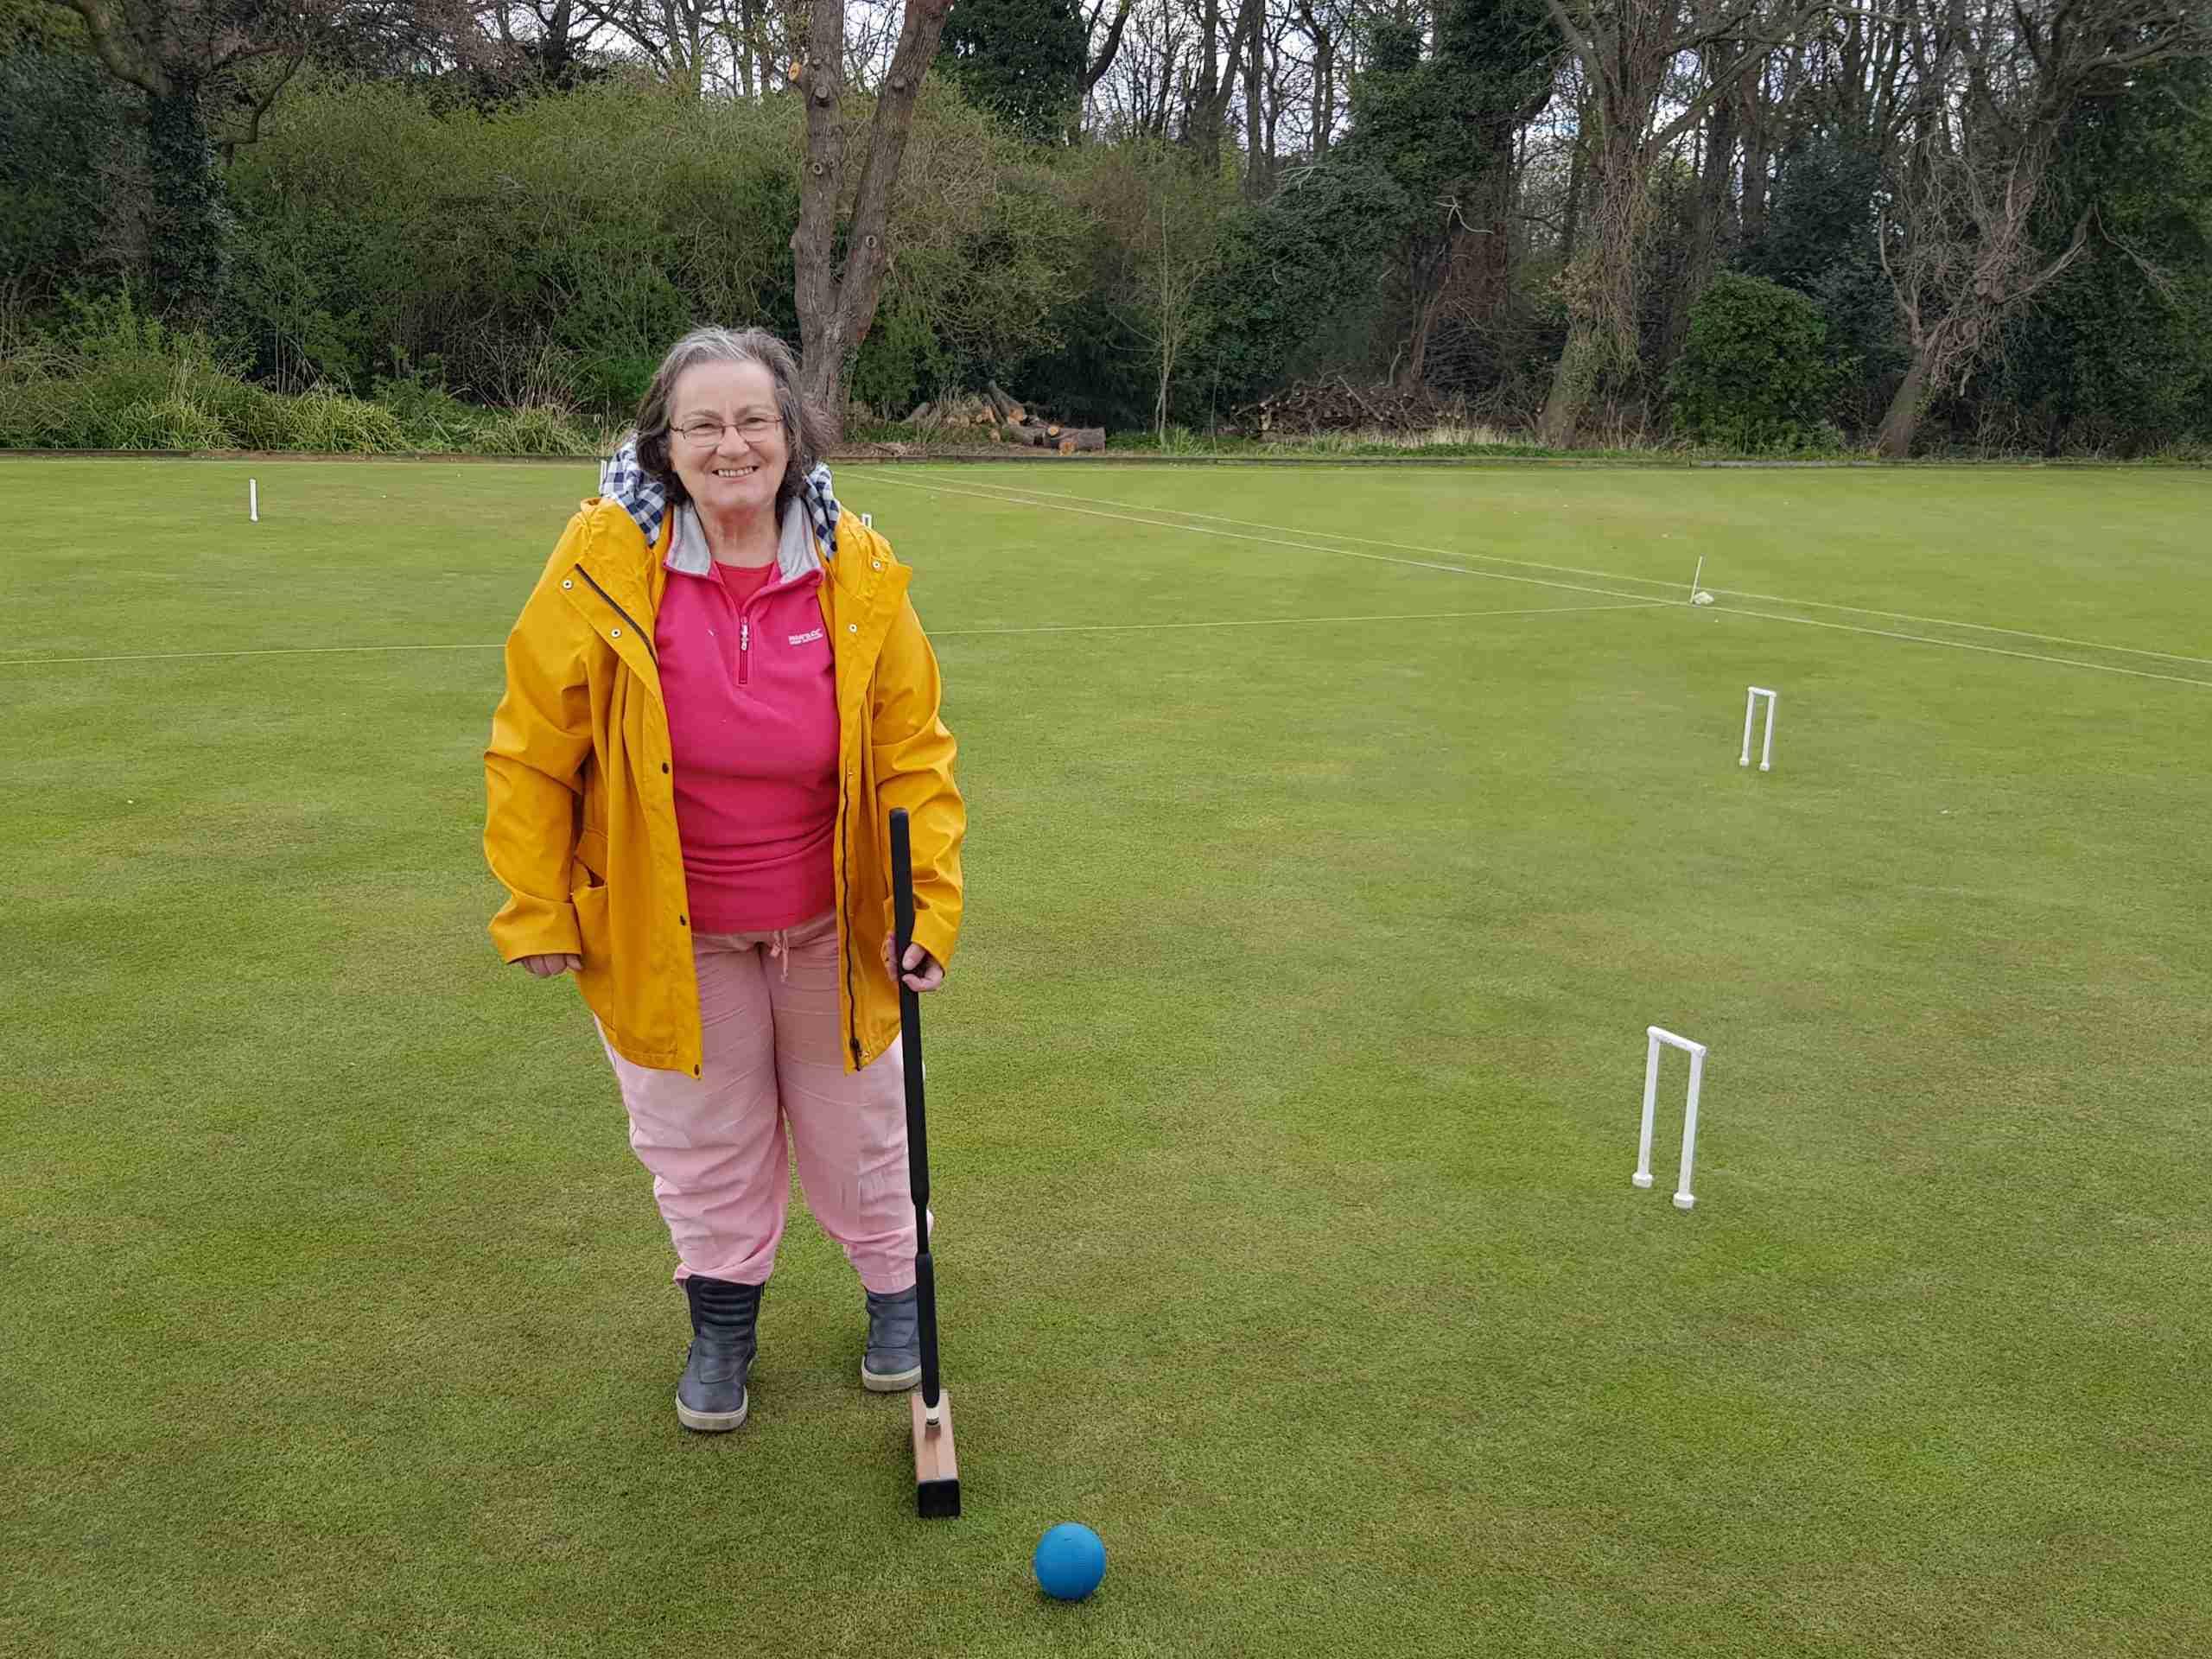 How outdoor sport in Beeston is bouncing back after lockdown